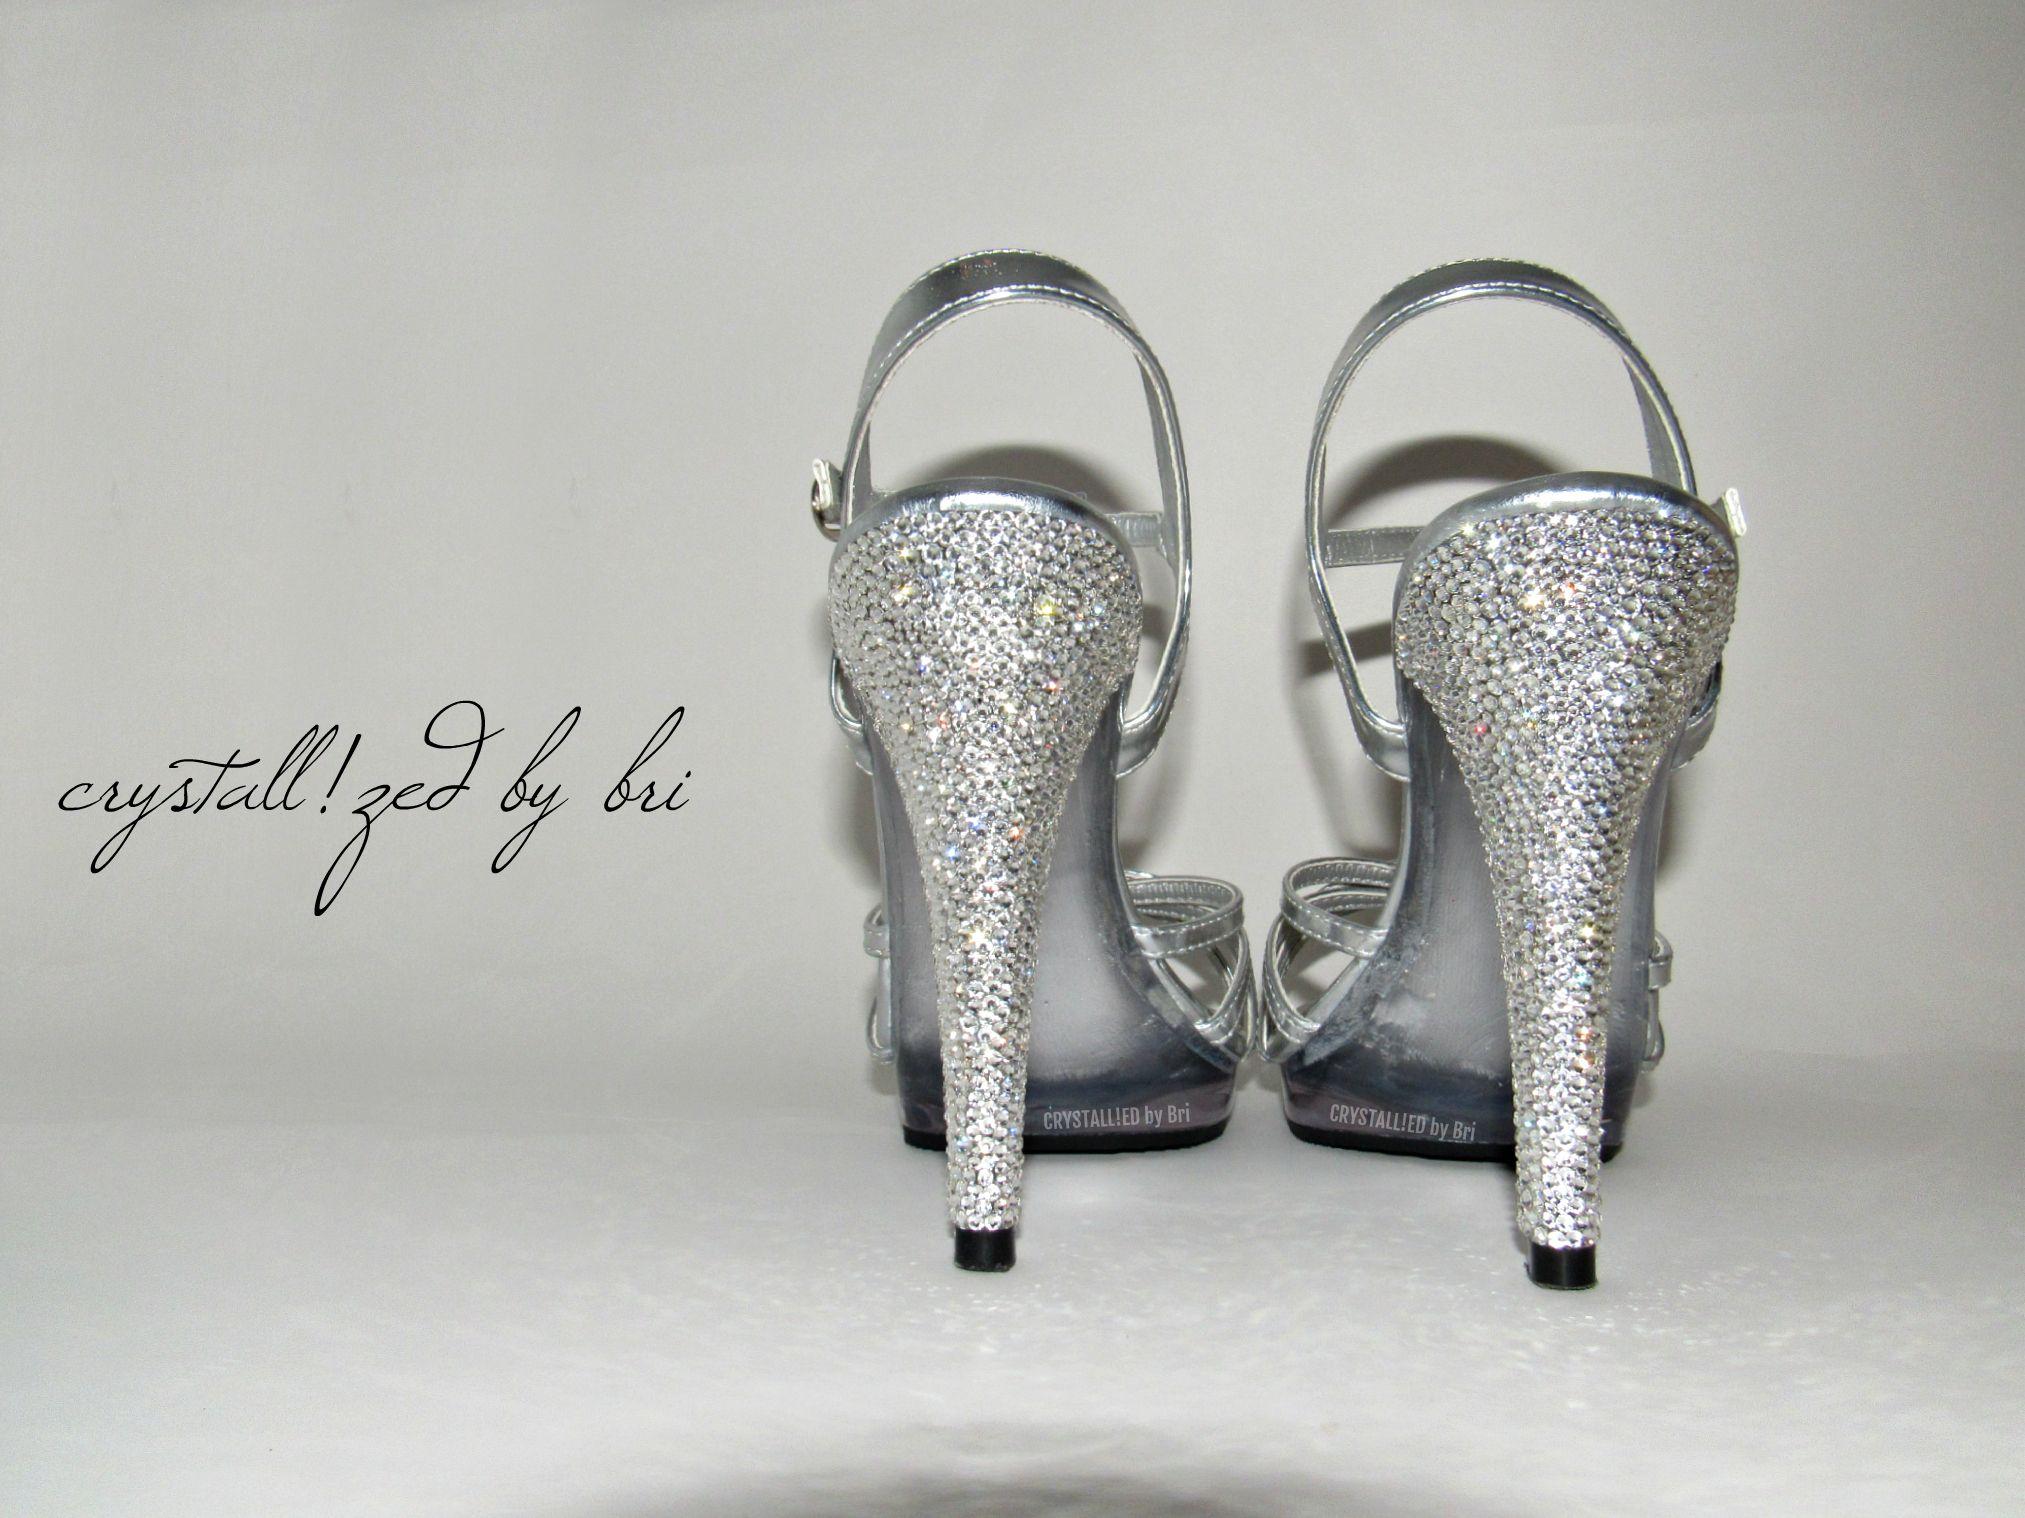 200b1bd740 Custom Made Crystallized Stiletto Heels Made With Swarovski Crystals -  Heels Only